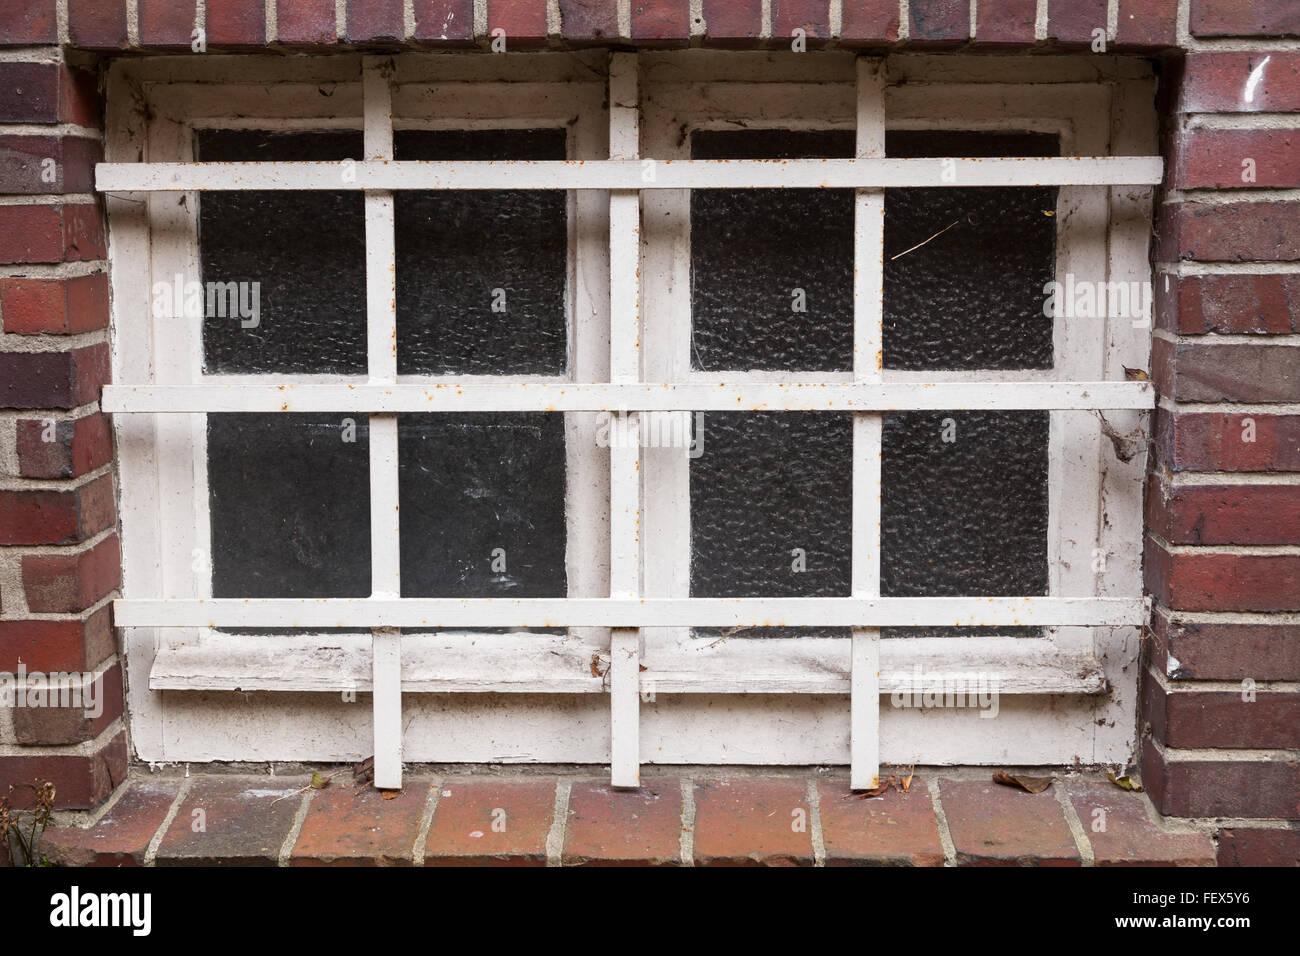 cellar window barred - Stock Image & Cellar Window Stock Photos u0026 Cellar Window Stock Images - Alamy